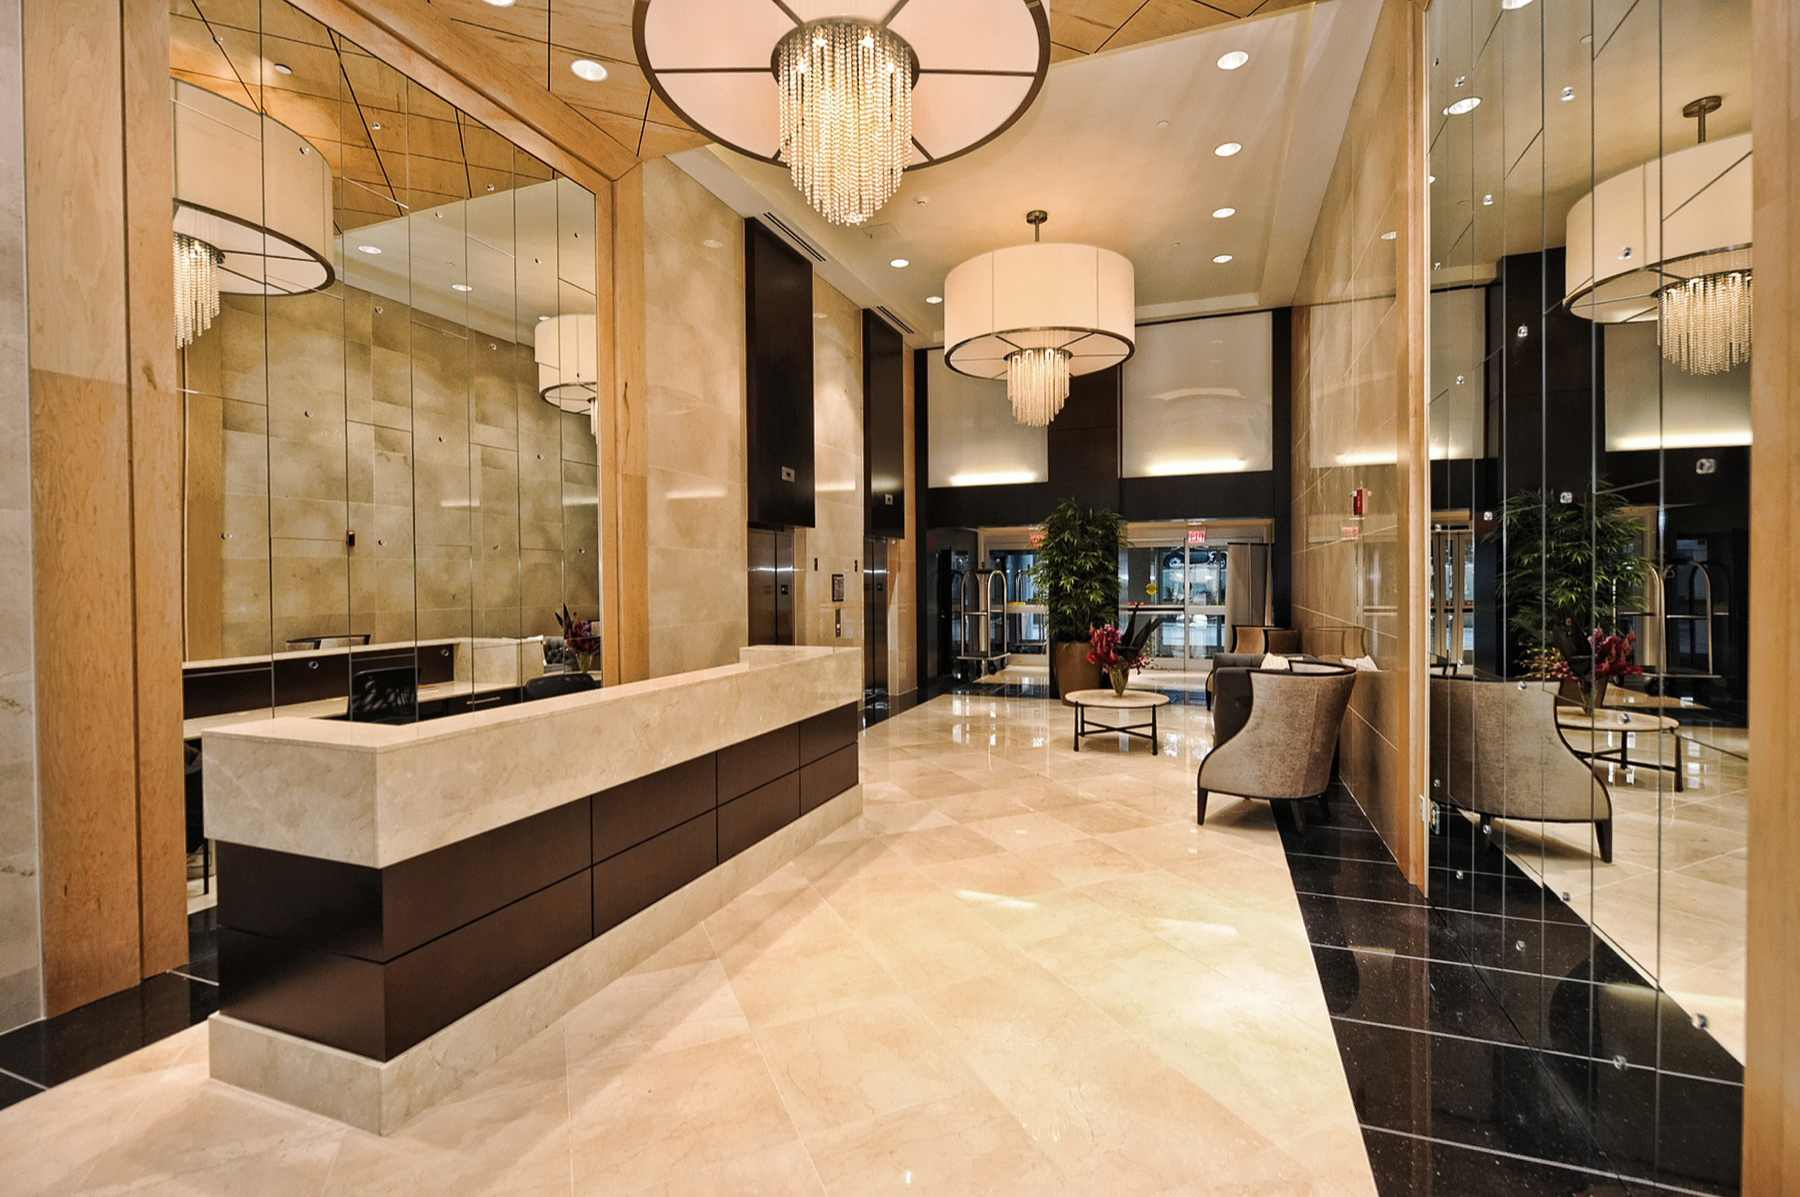 SKYE Luxury Condos Charlotte Luxury Condos